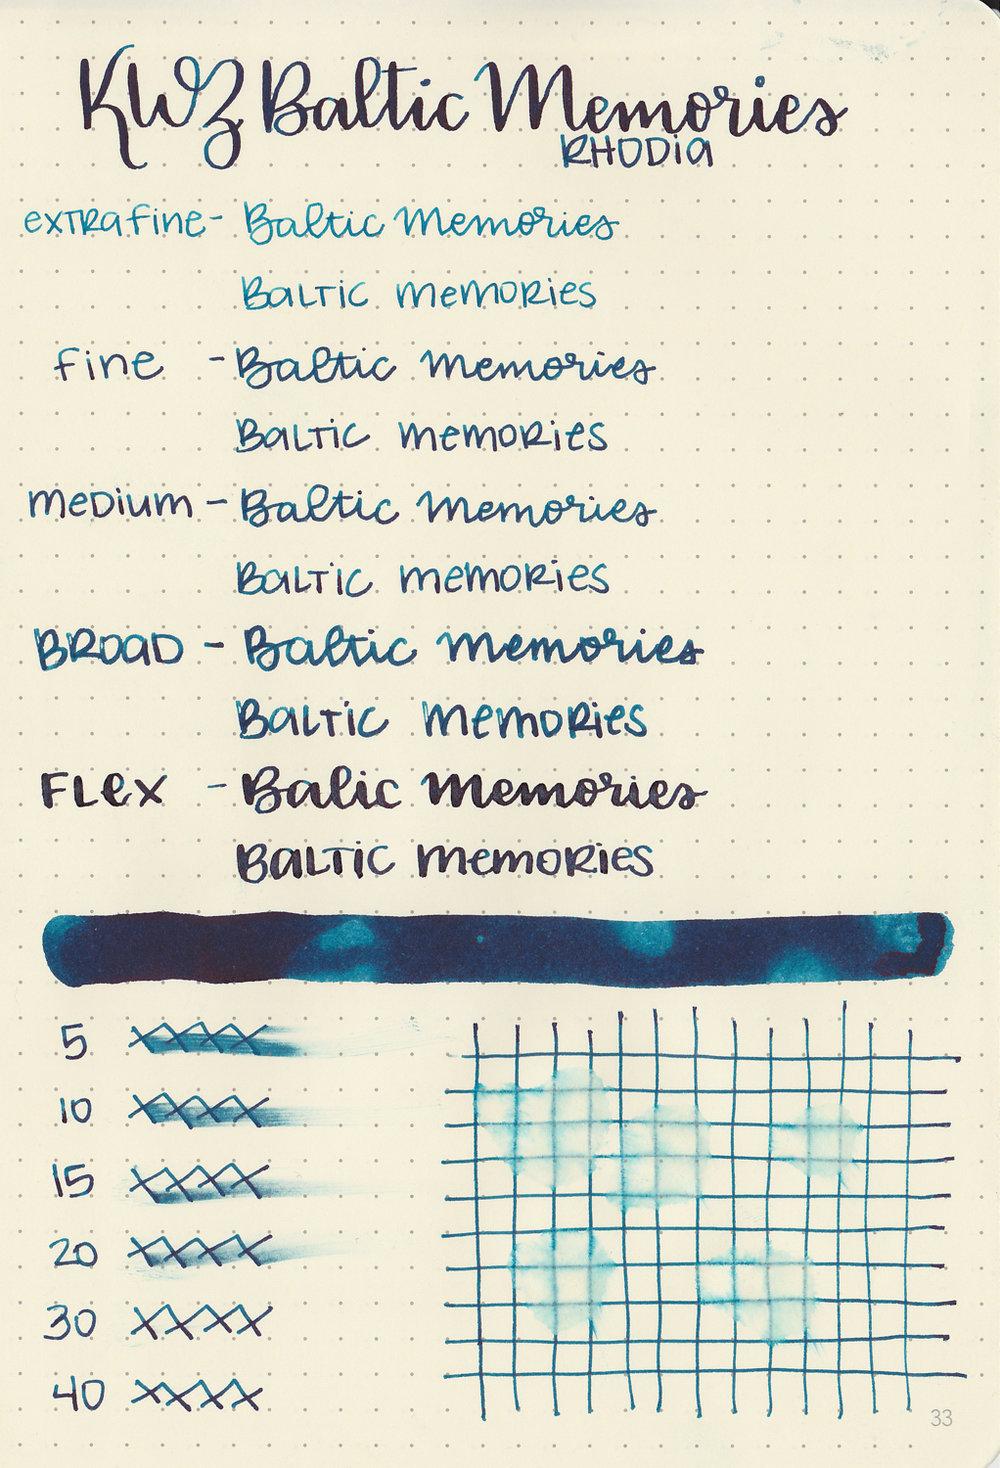 kwz-baltic-memories-3.jpg